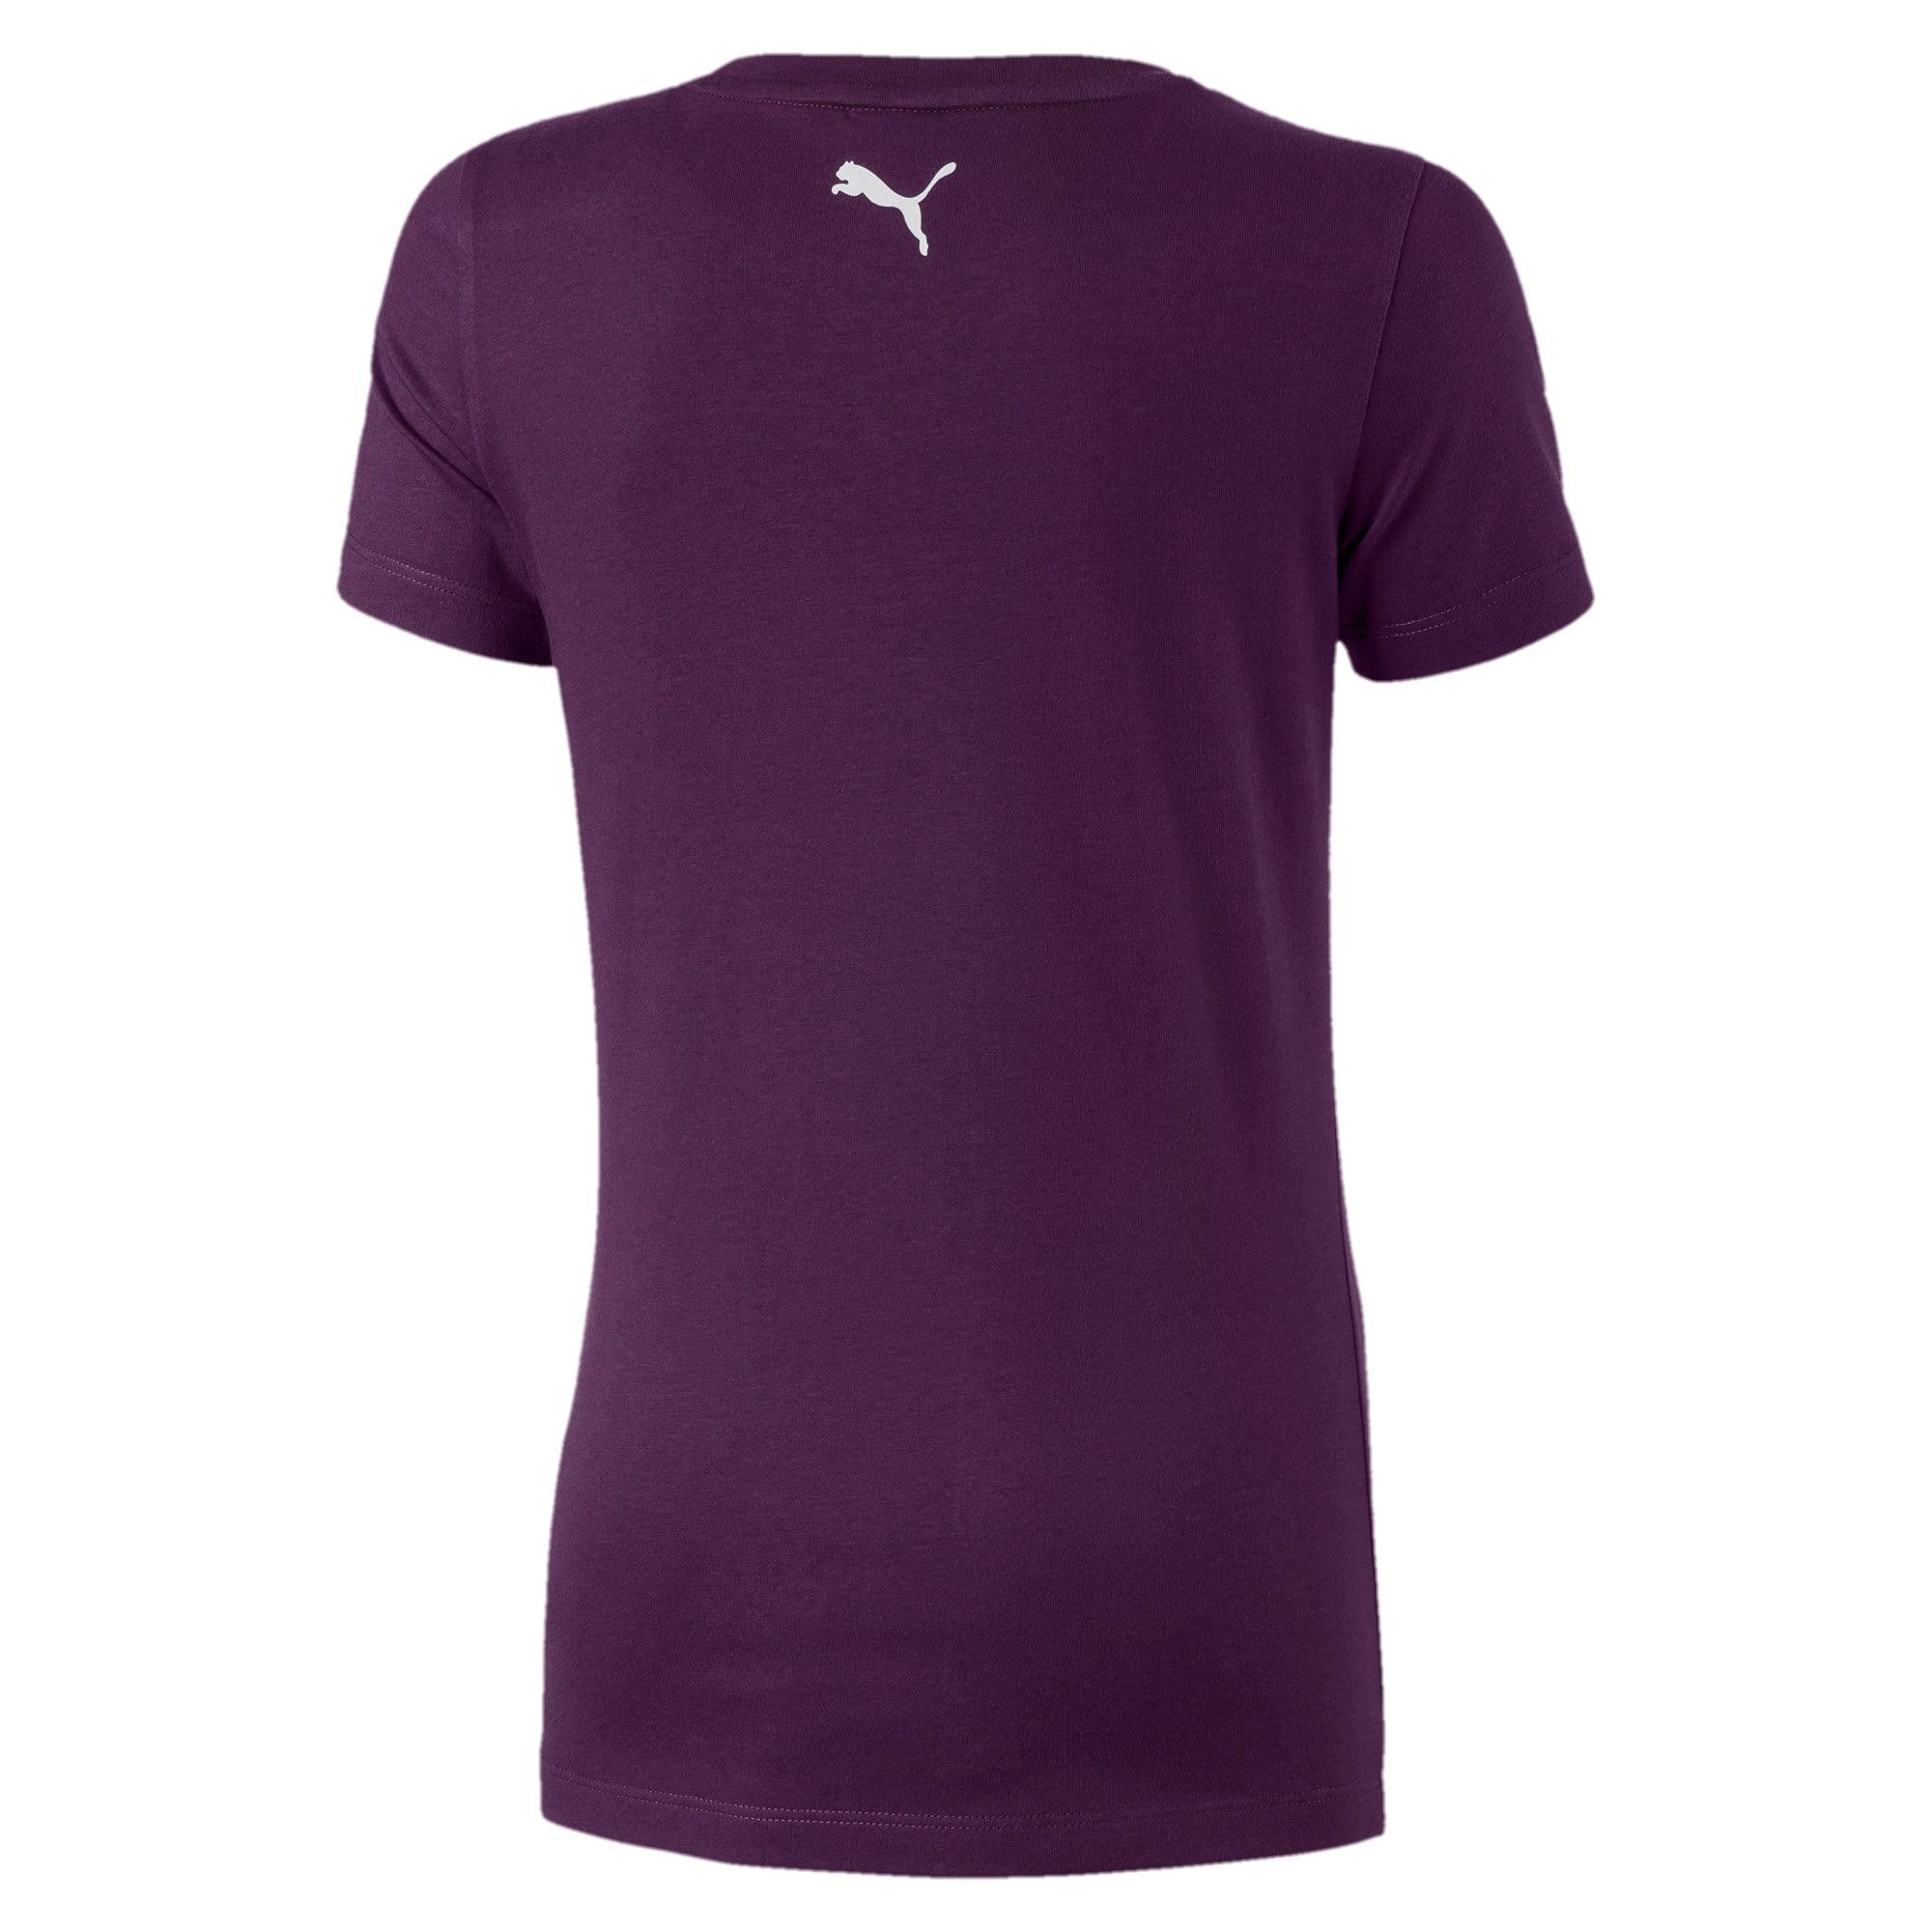 Thumbnail 2 of Alpha Logo Short Sleeve Girls' Tee, Plum Purple, medium-IND